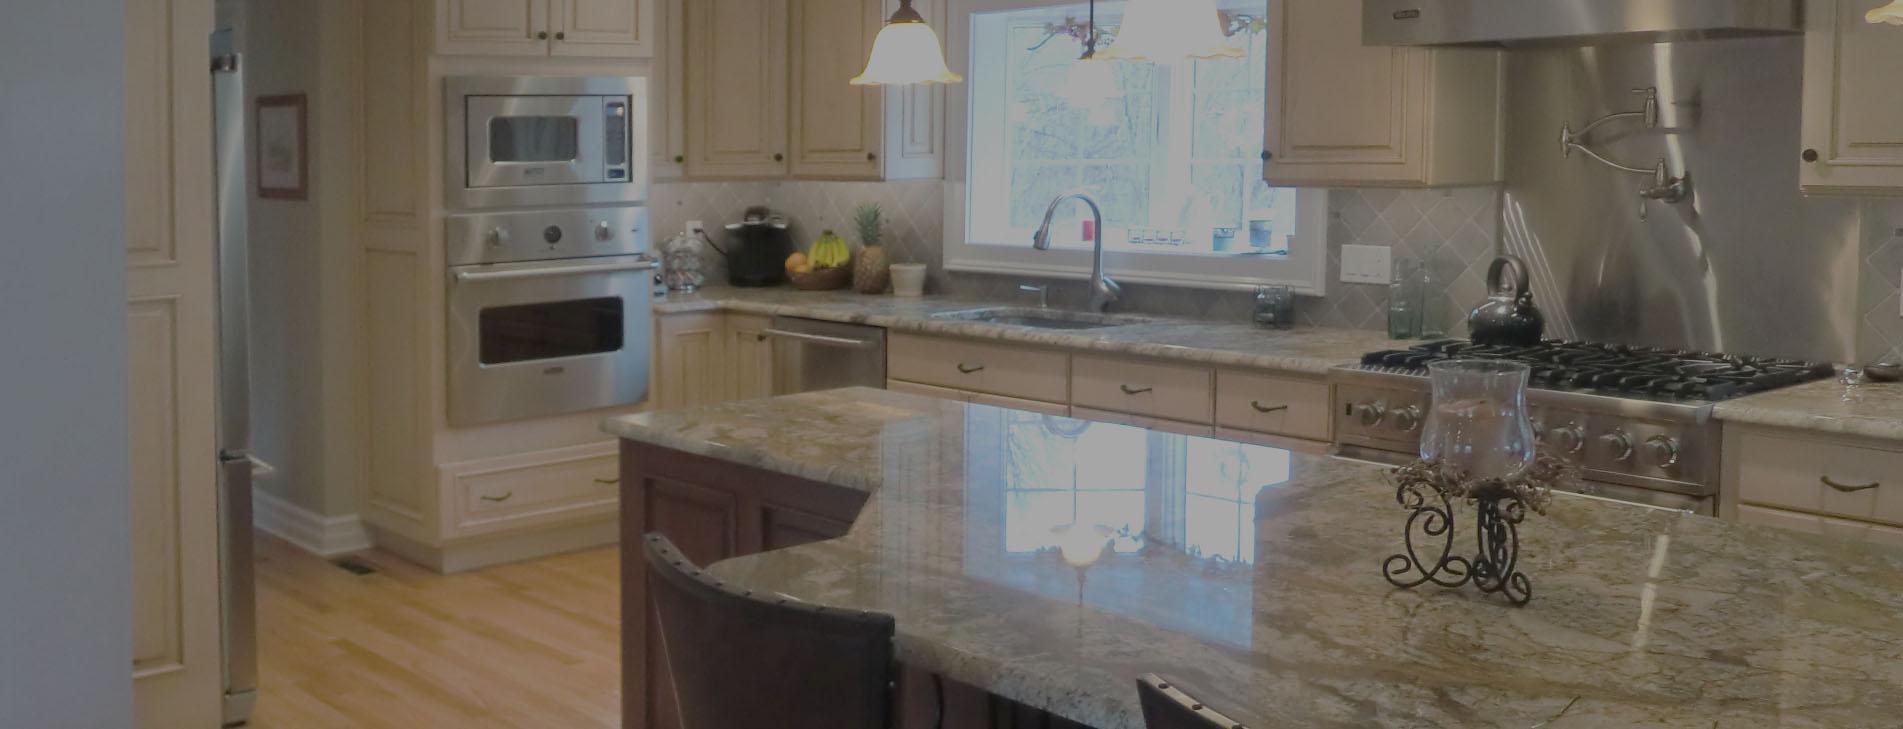 Medium Bright Kitchen Remodel